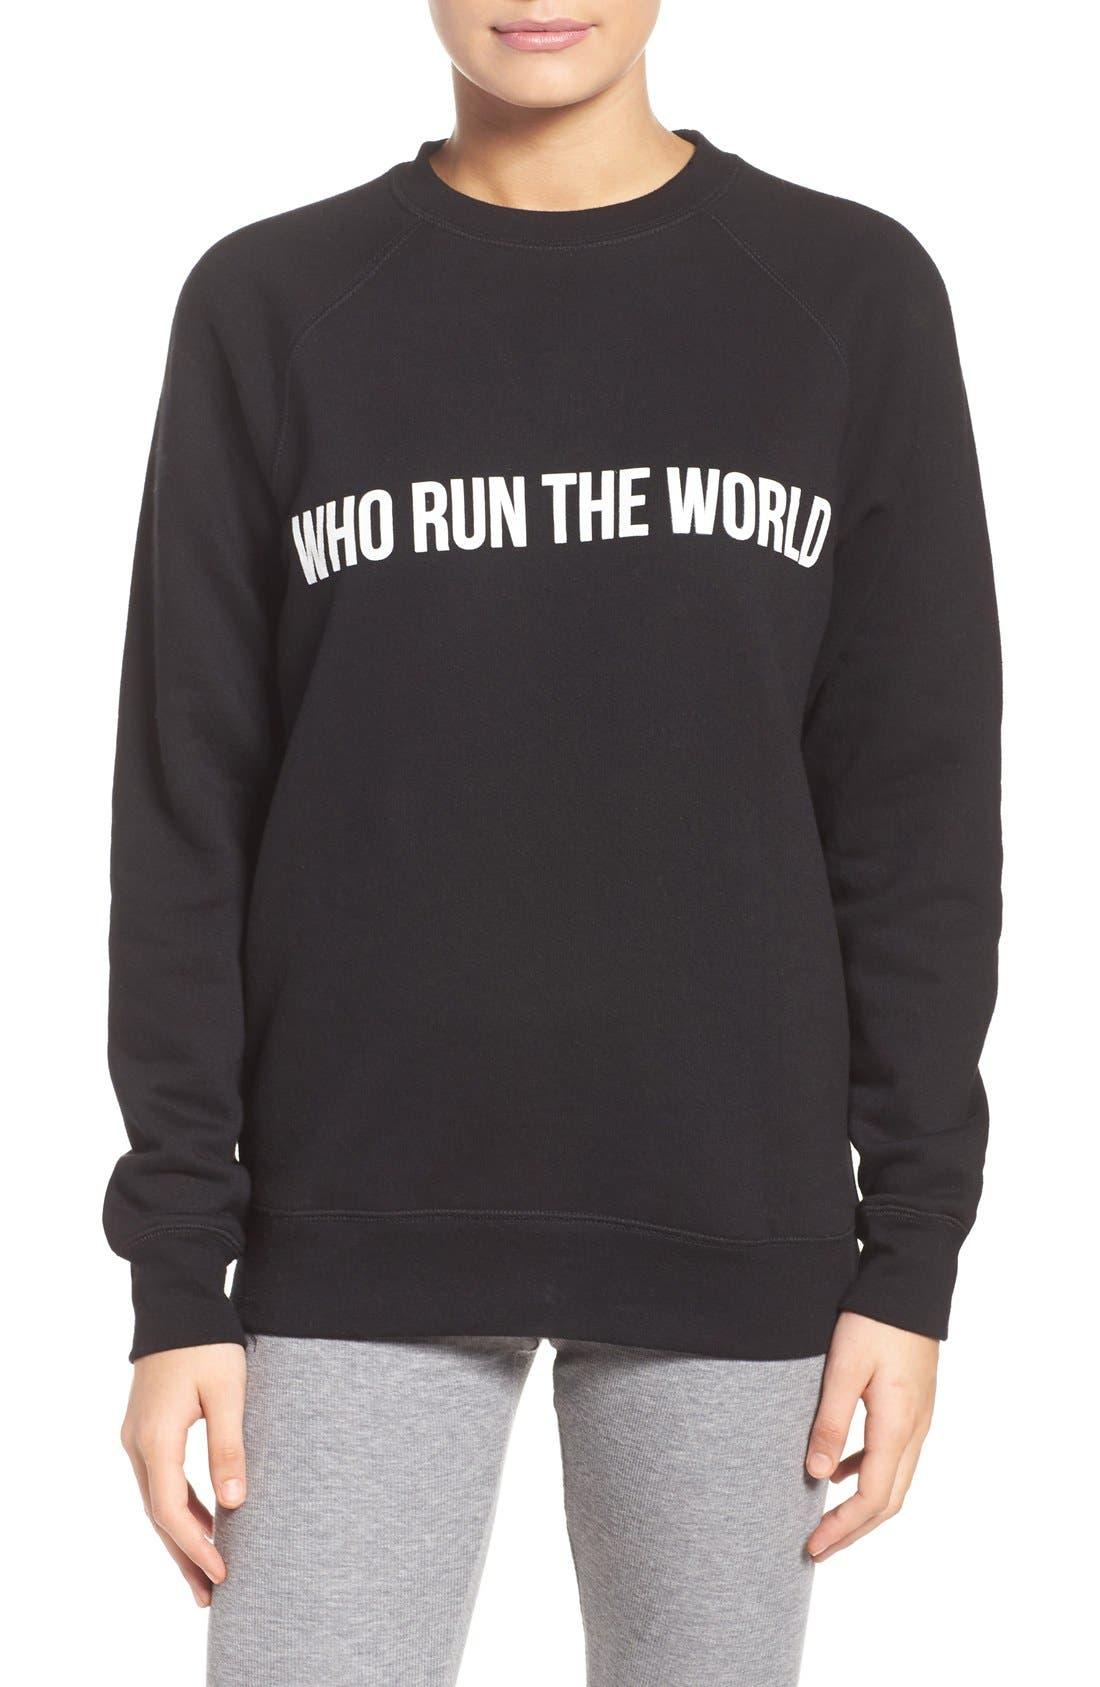 BRUNETTE the Label Who Run the World Sweatshirt